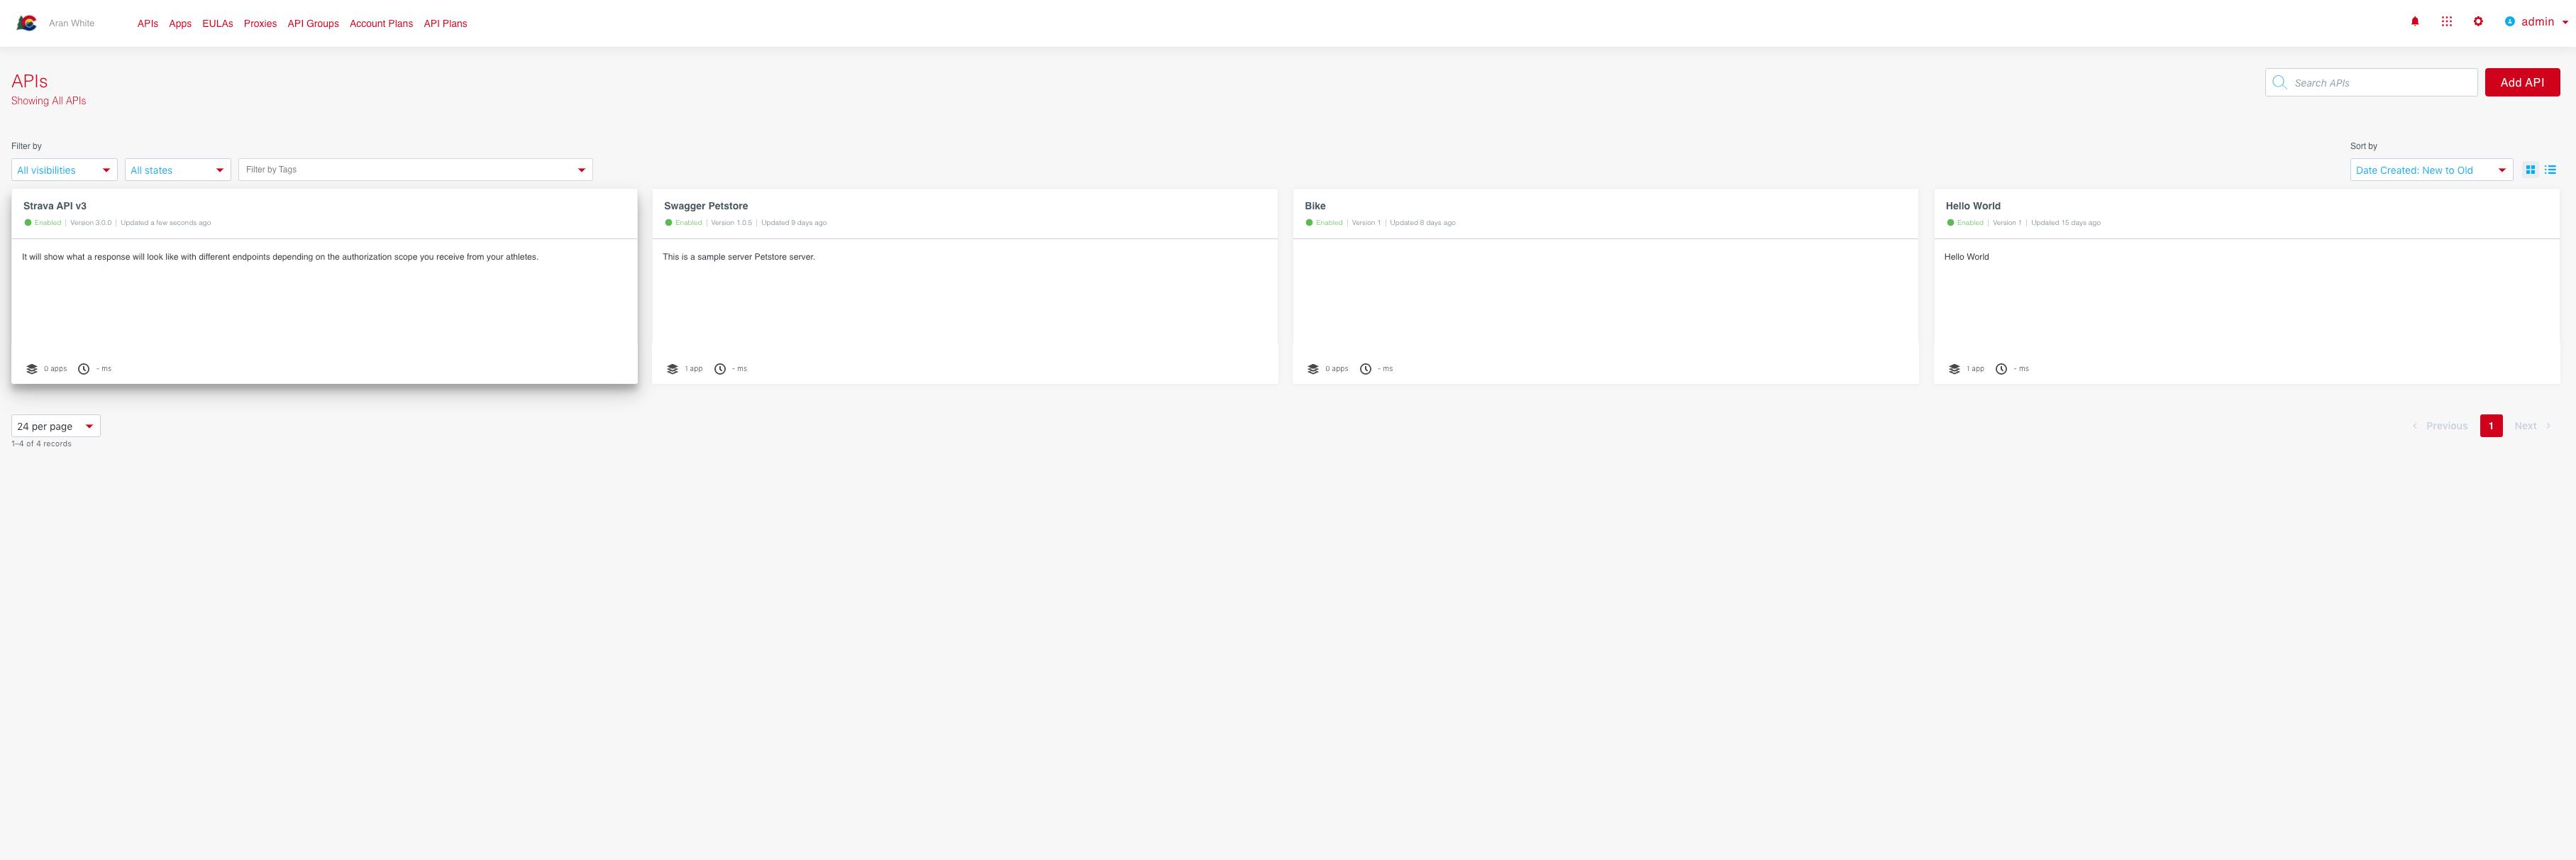 Running BlazeMeter with Layer 7